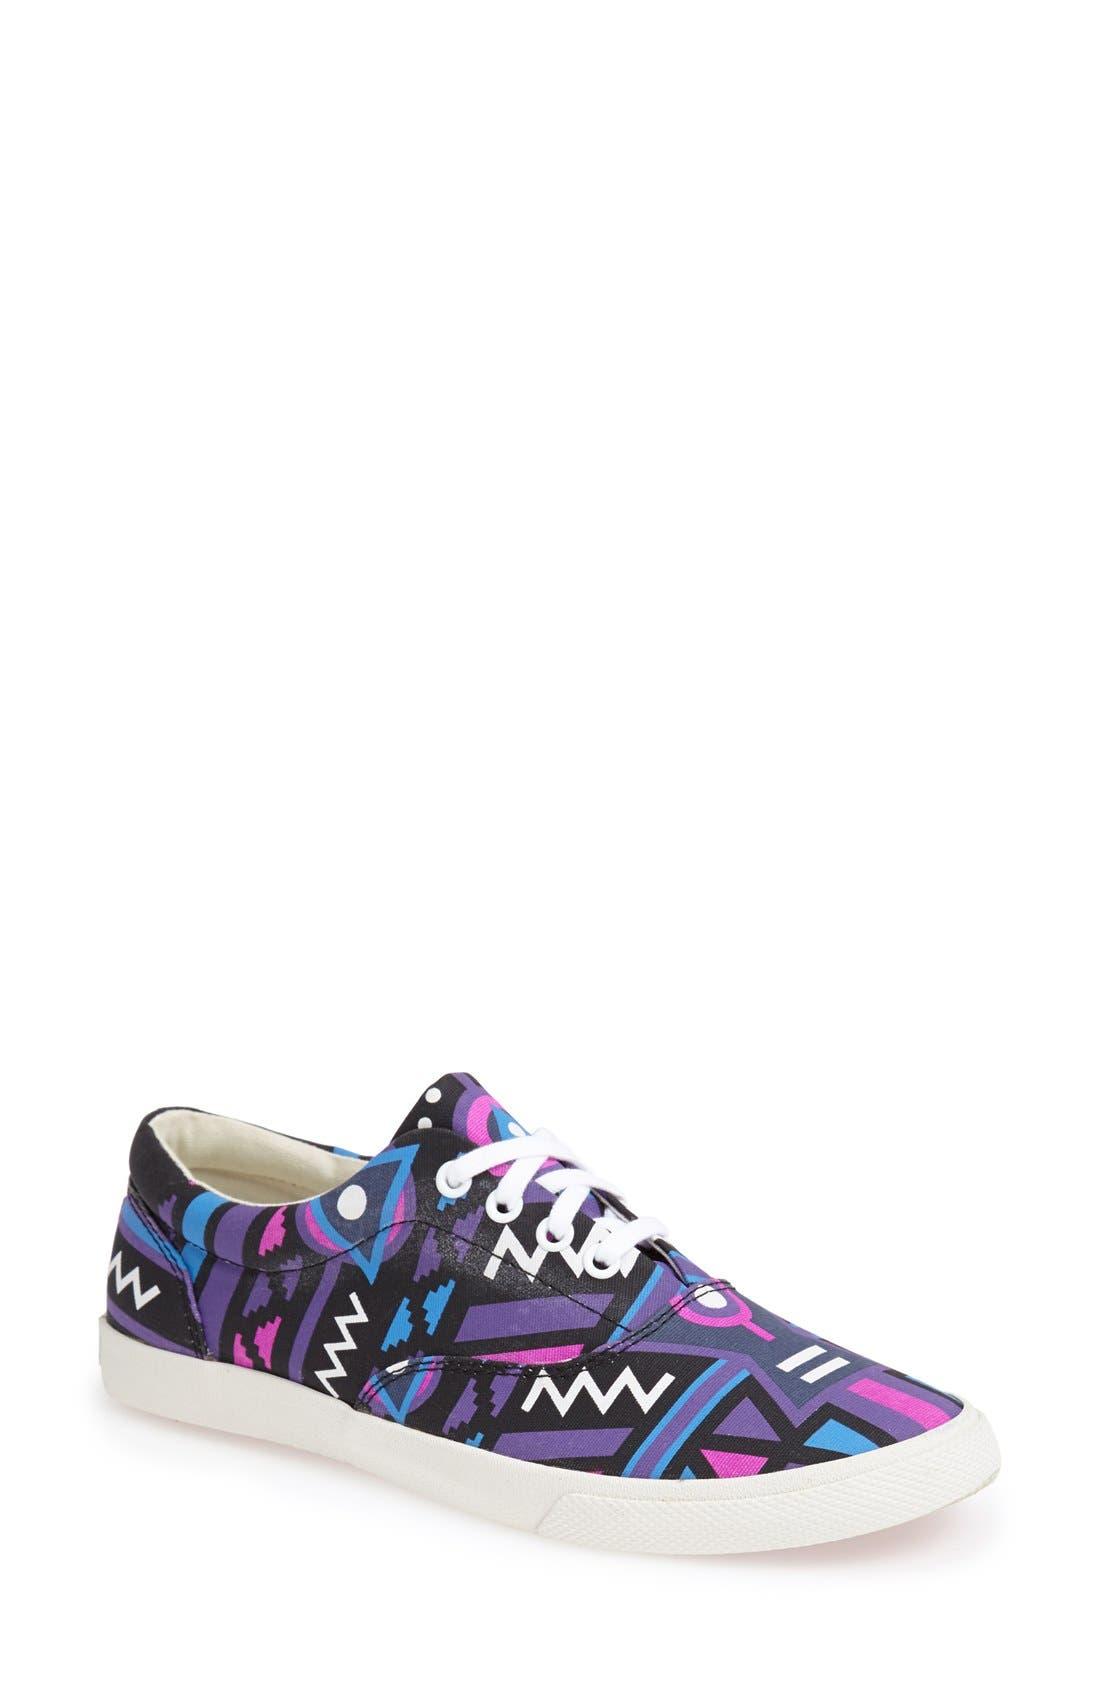 Main Image - BucketFeet 'Cosmos 2' Sneaker (Women)